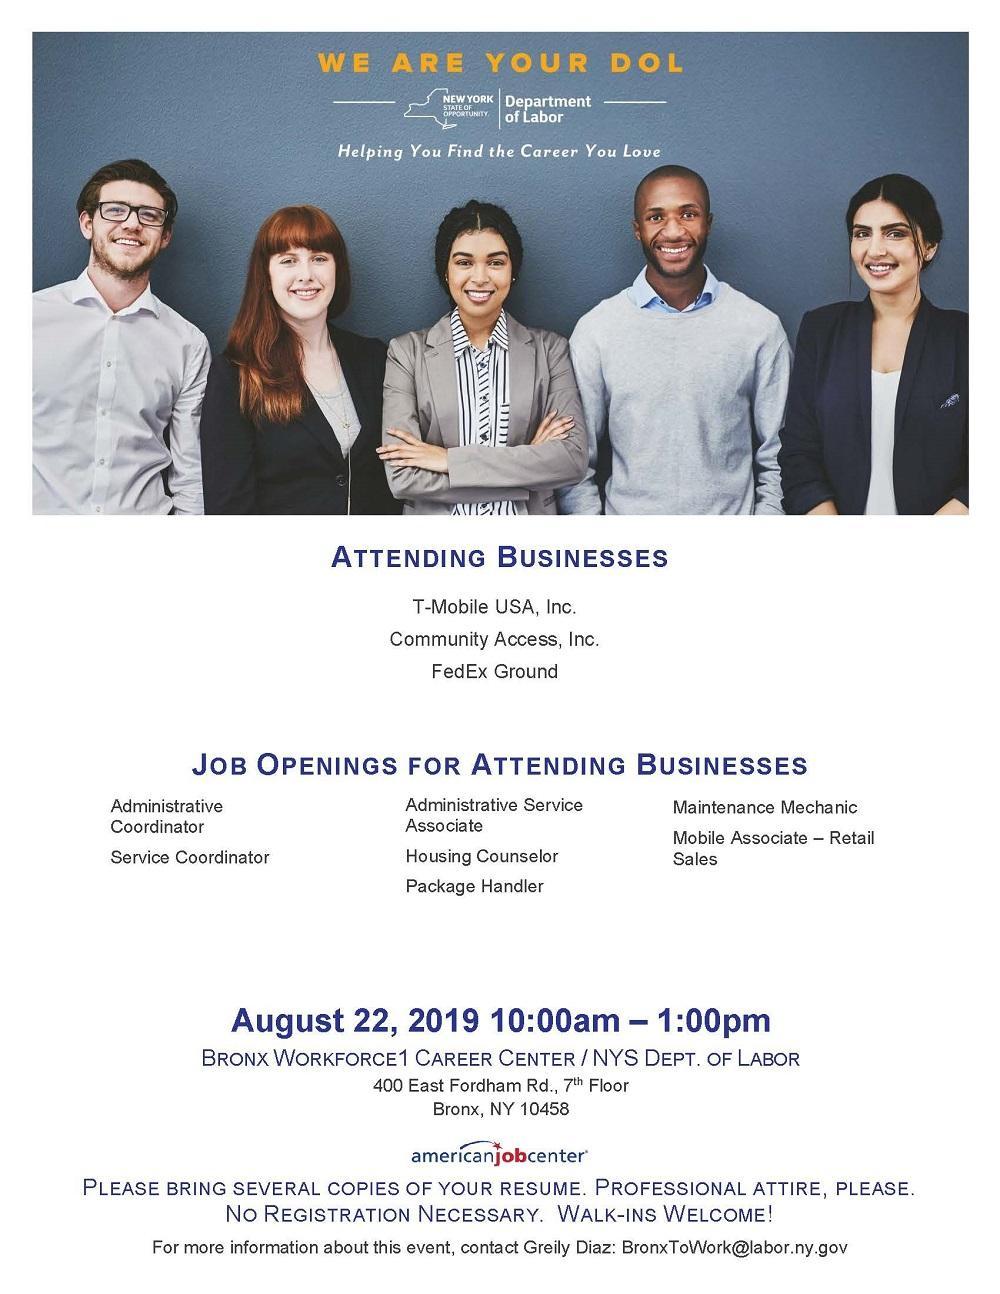 Bronx Career Fair To Be Held On August 22, 2019